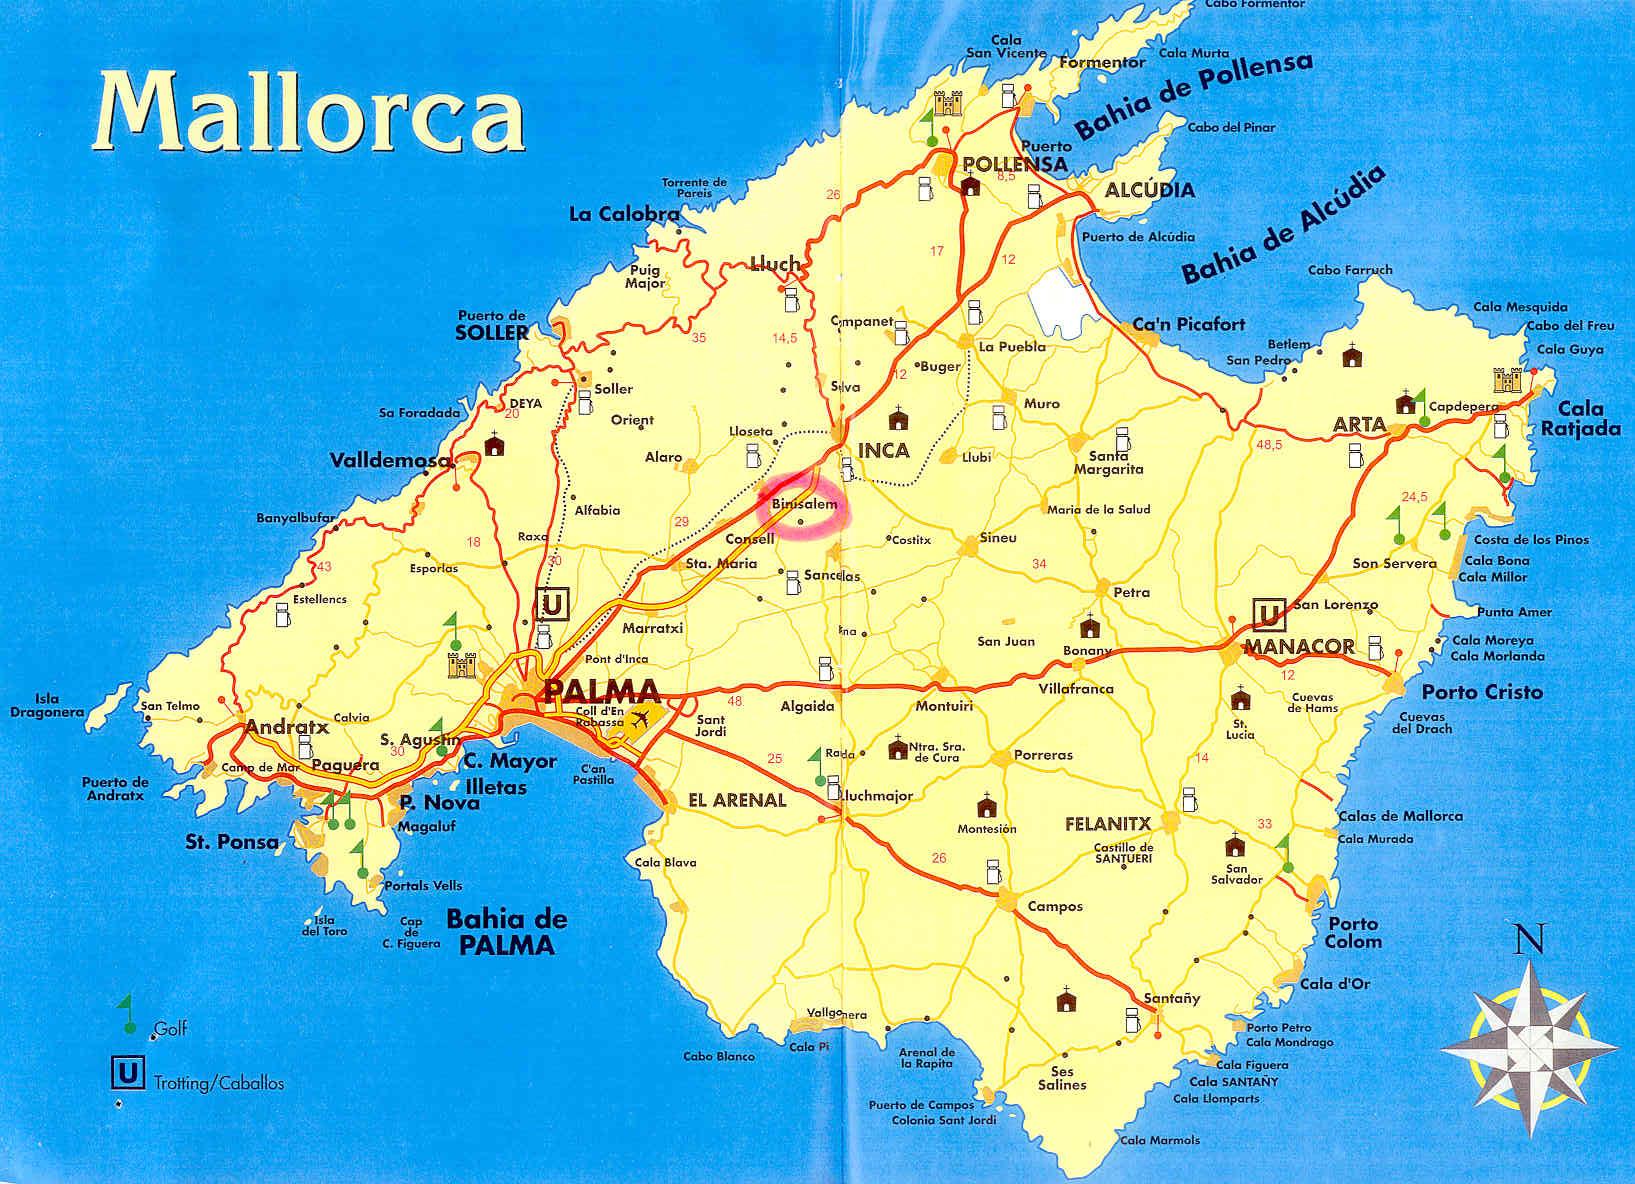 Mallorca-finca-am-tramuntana-gebirge.de